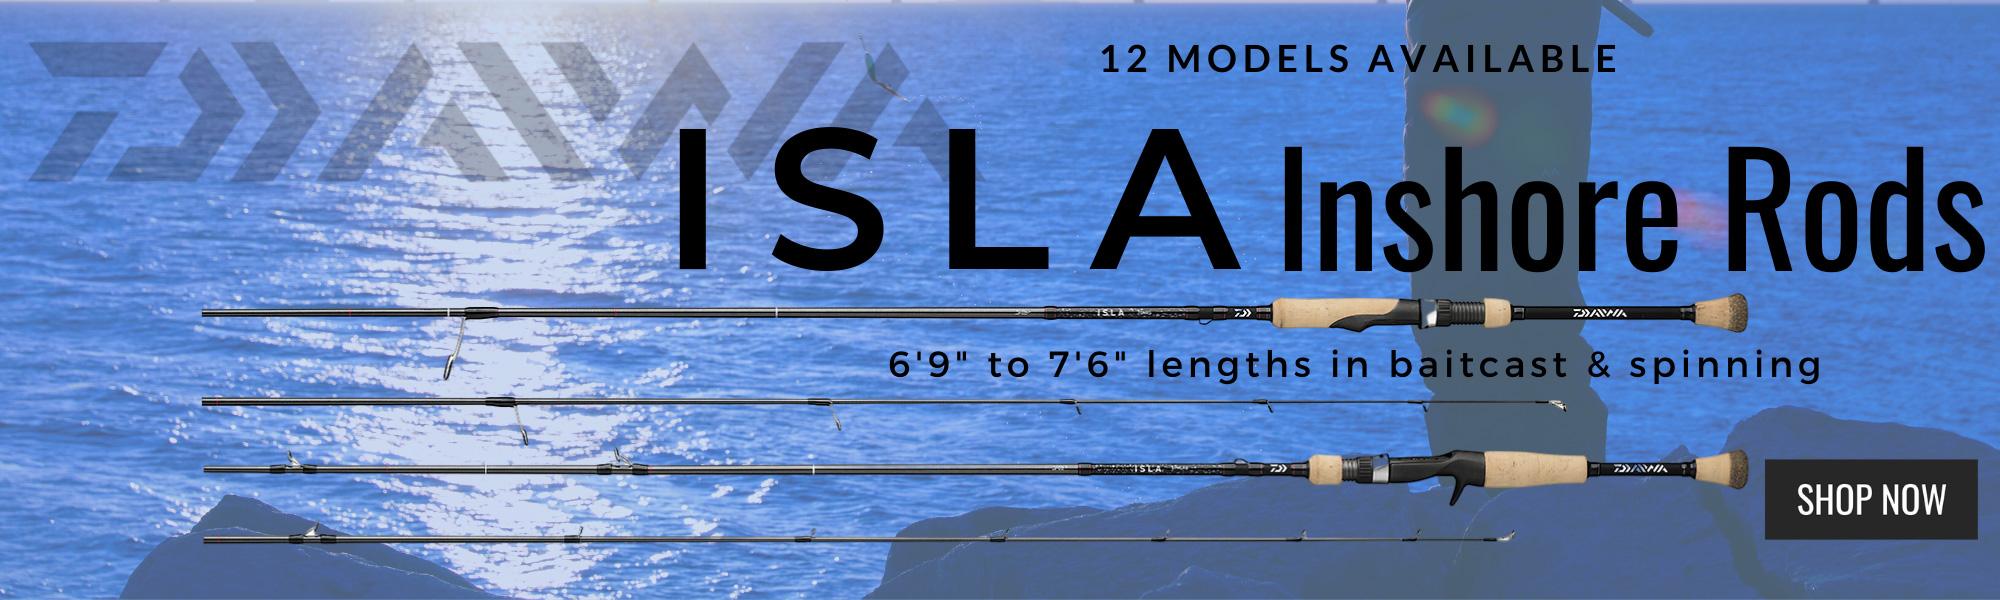 isla inshore rods